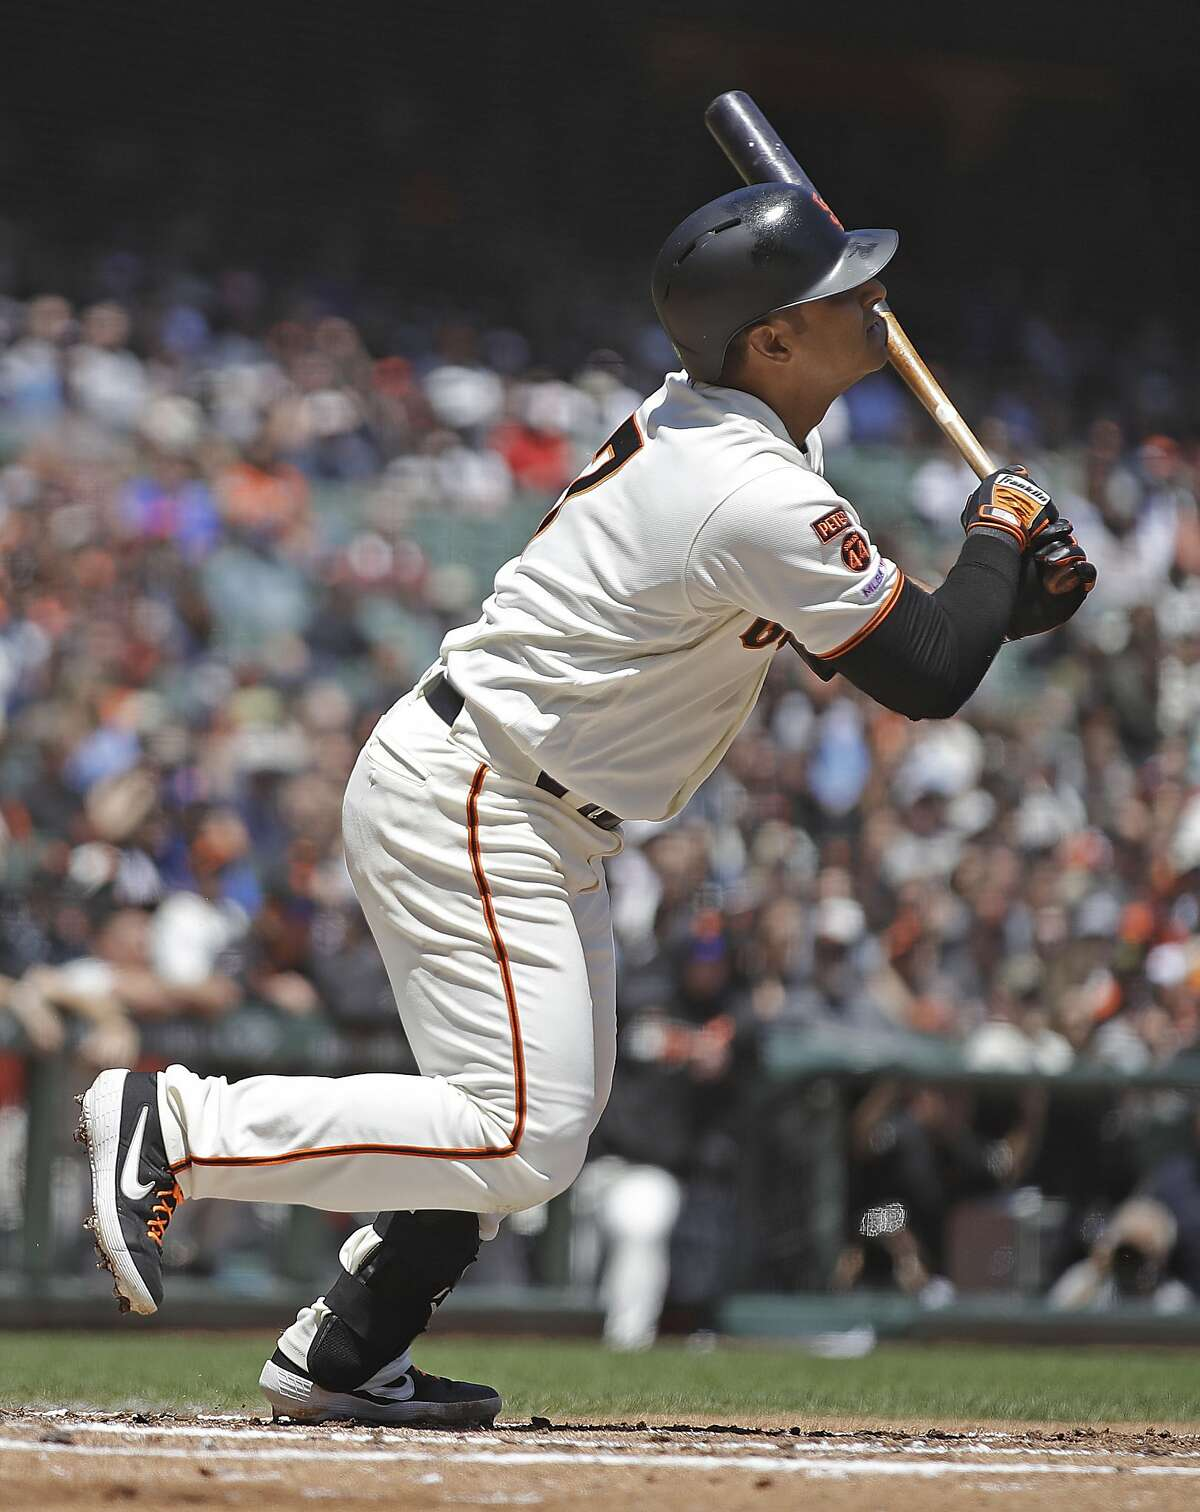 San Francisco Giants' Donovan Solano hits for an RBI sacrifice fly off Atlanta Braves' Kevin Gausman in the second inning of a baseball game Thursday, May 23, 2019, in San Francisco. (AP Photo/Ben Margot)